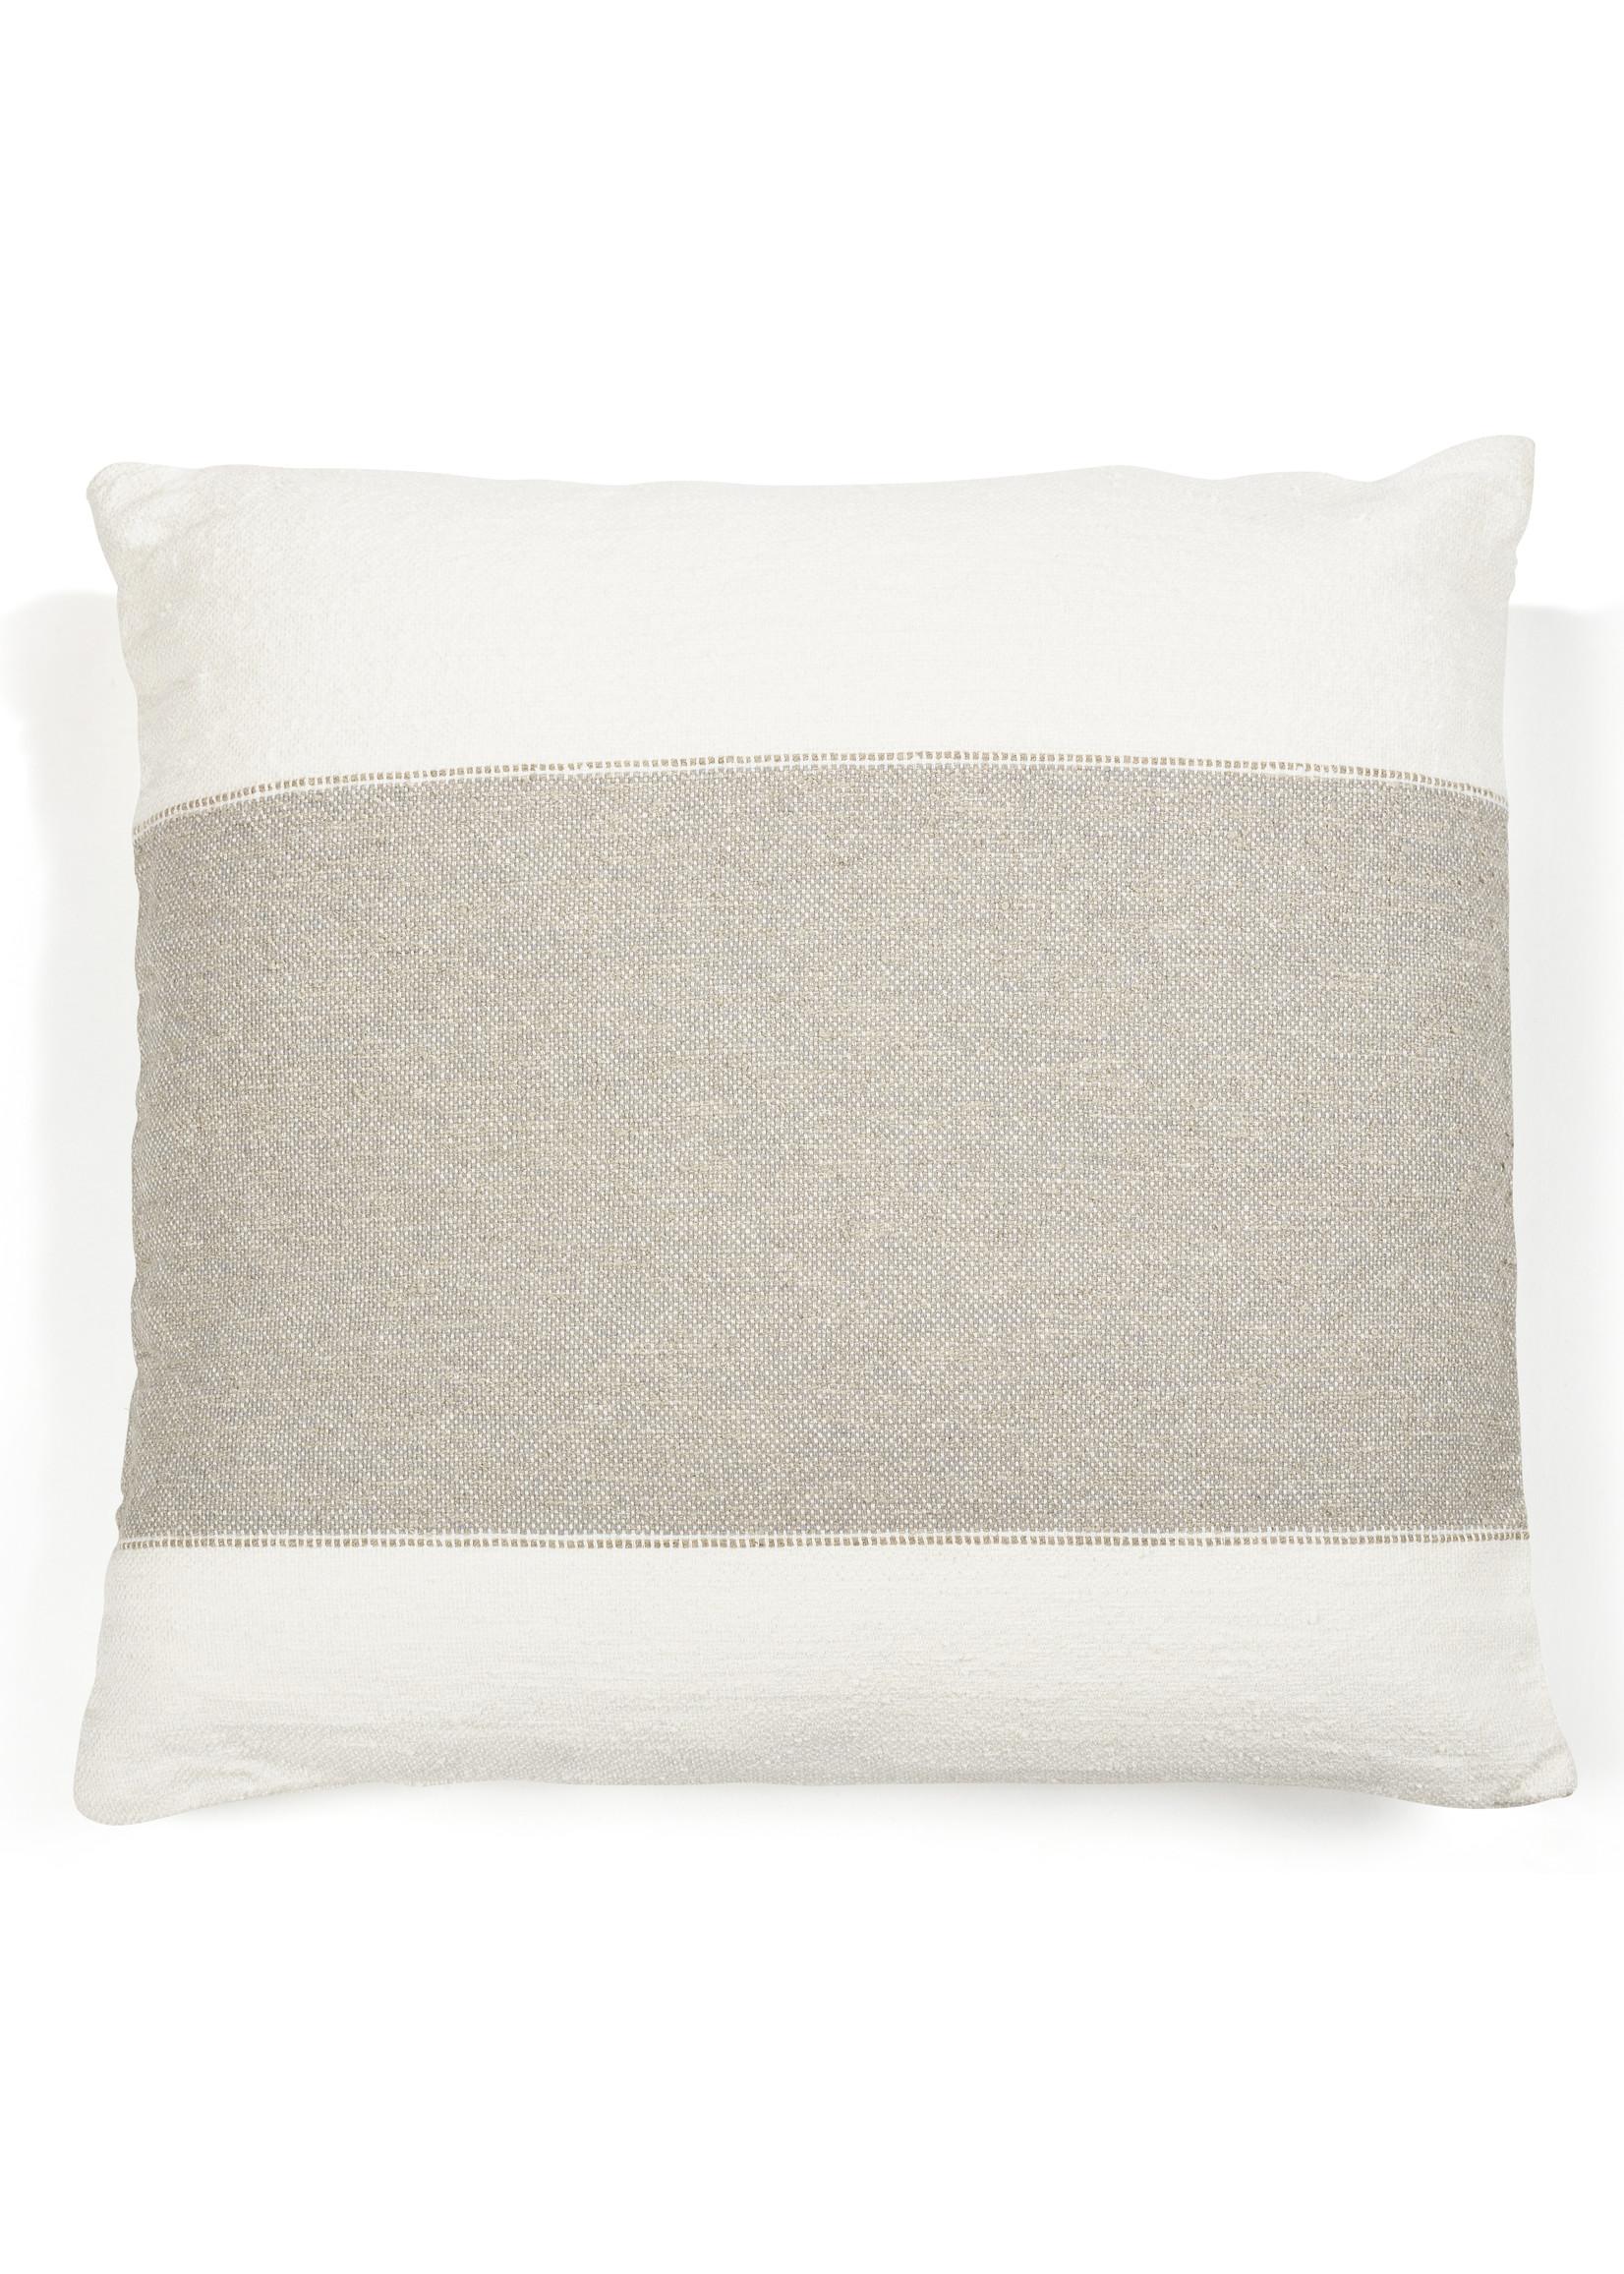 Libeco Libeco Charlotte Linen Pillow Cover